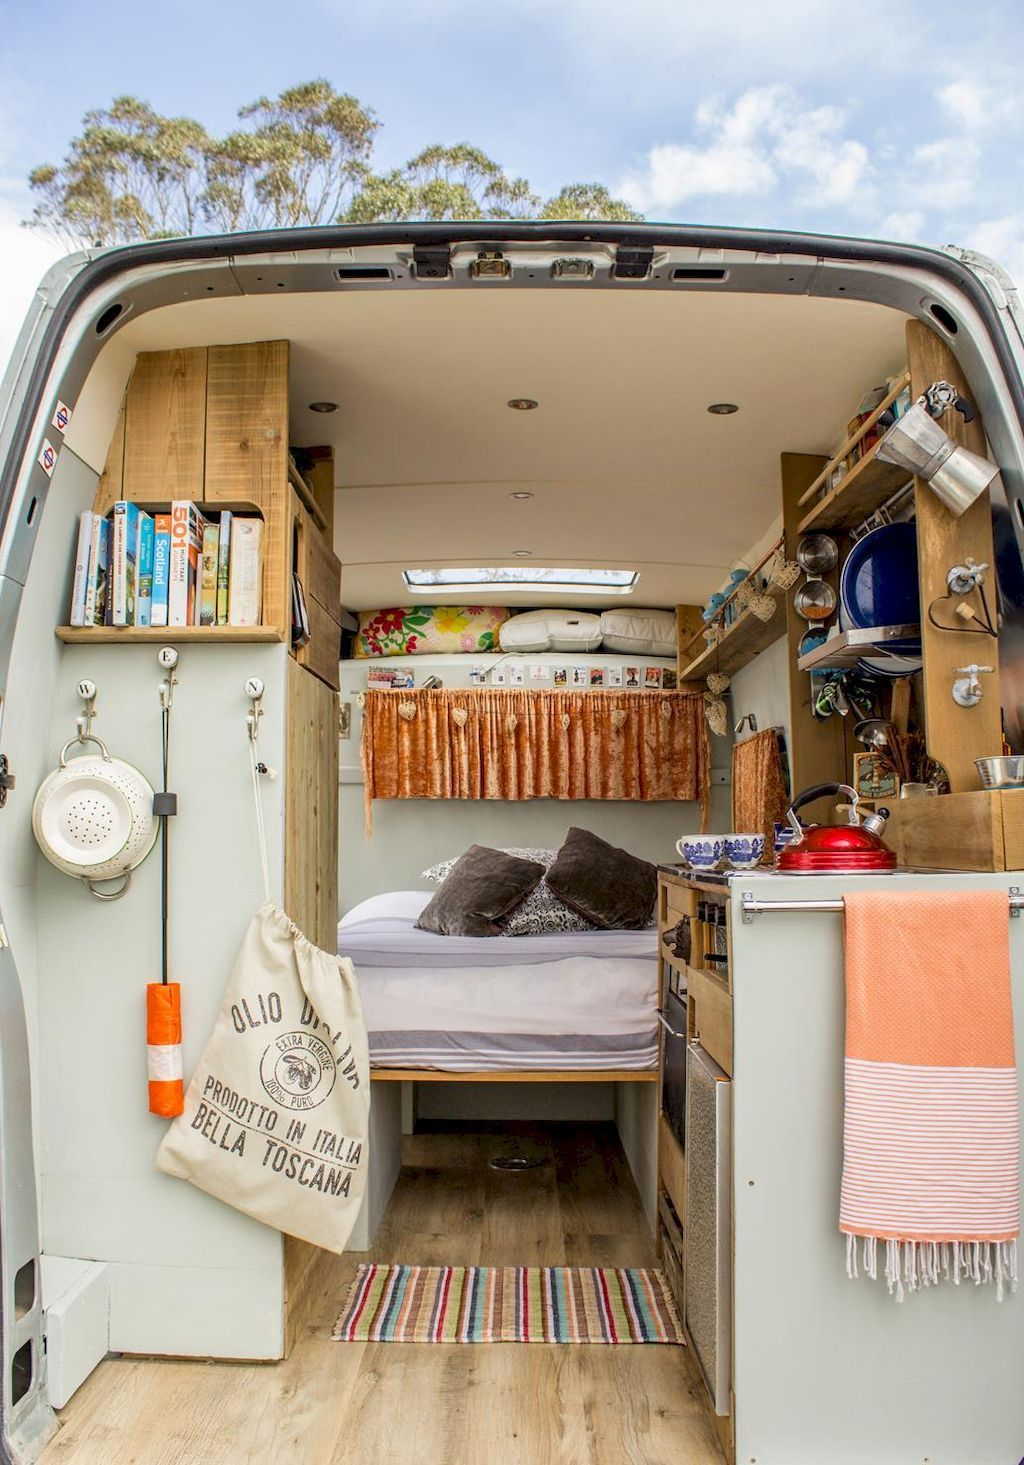 Camper Van Interior Design And Organization Ideas (19)